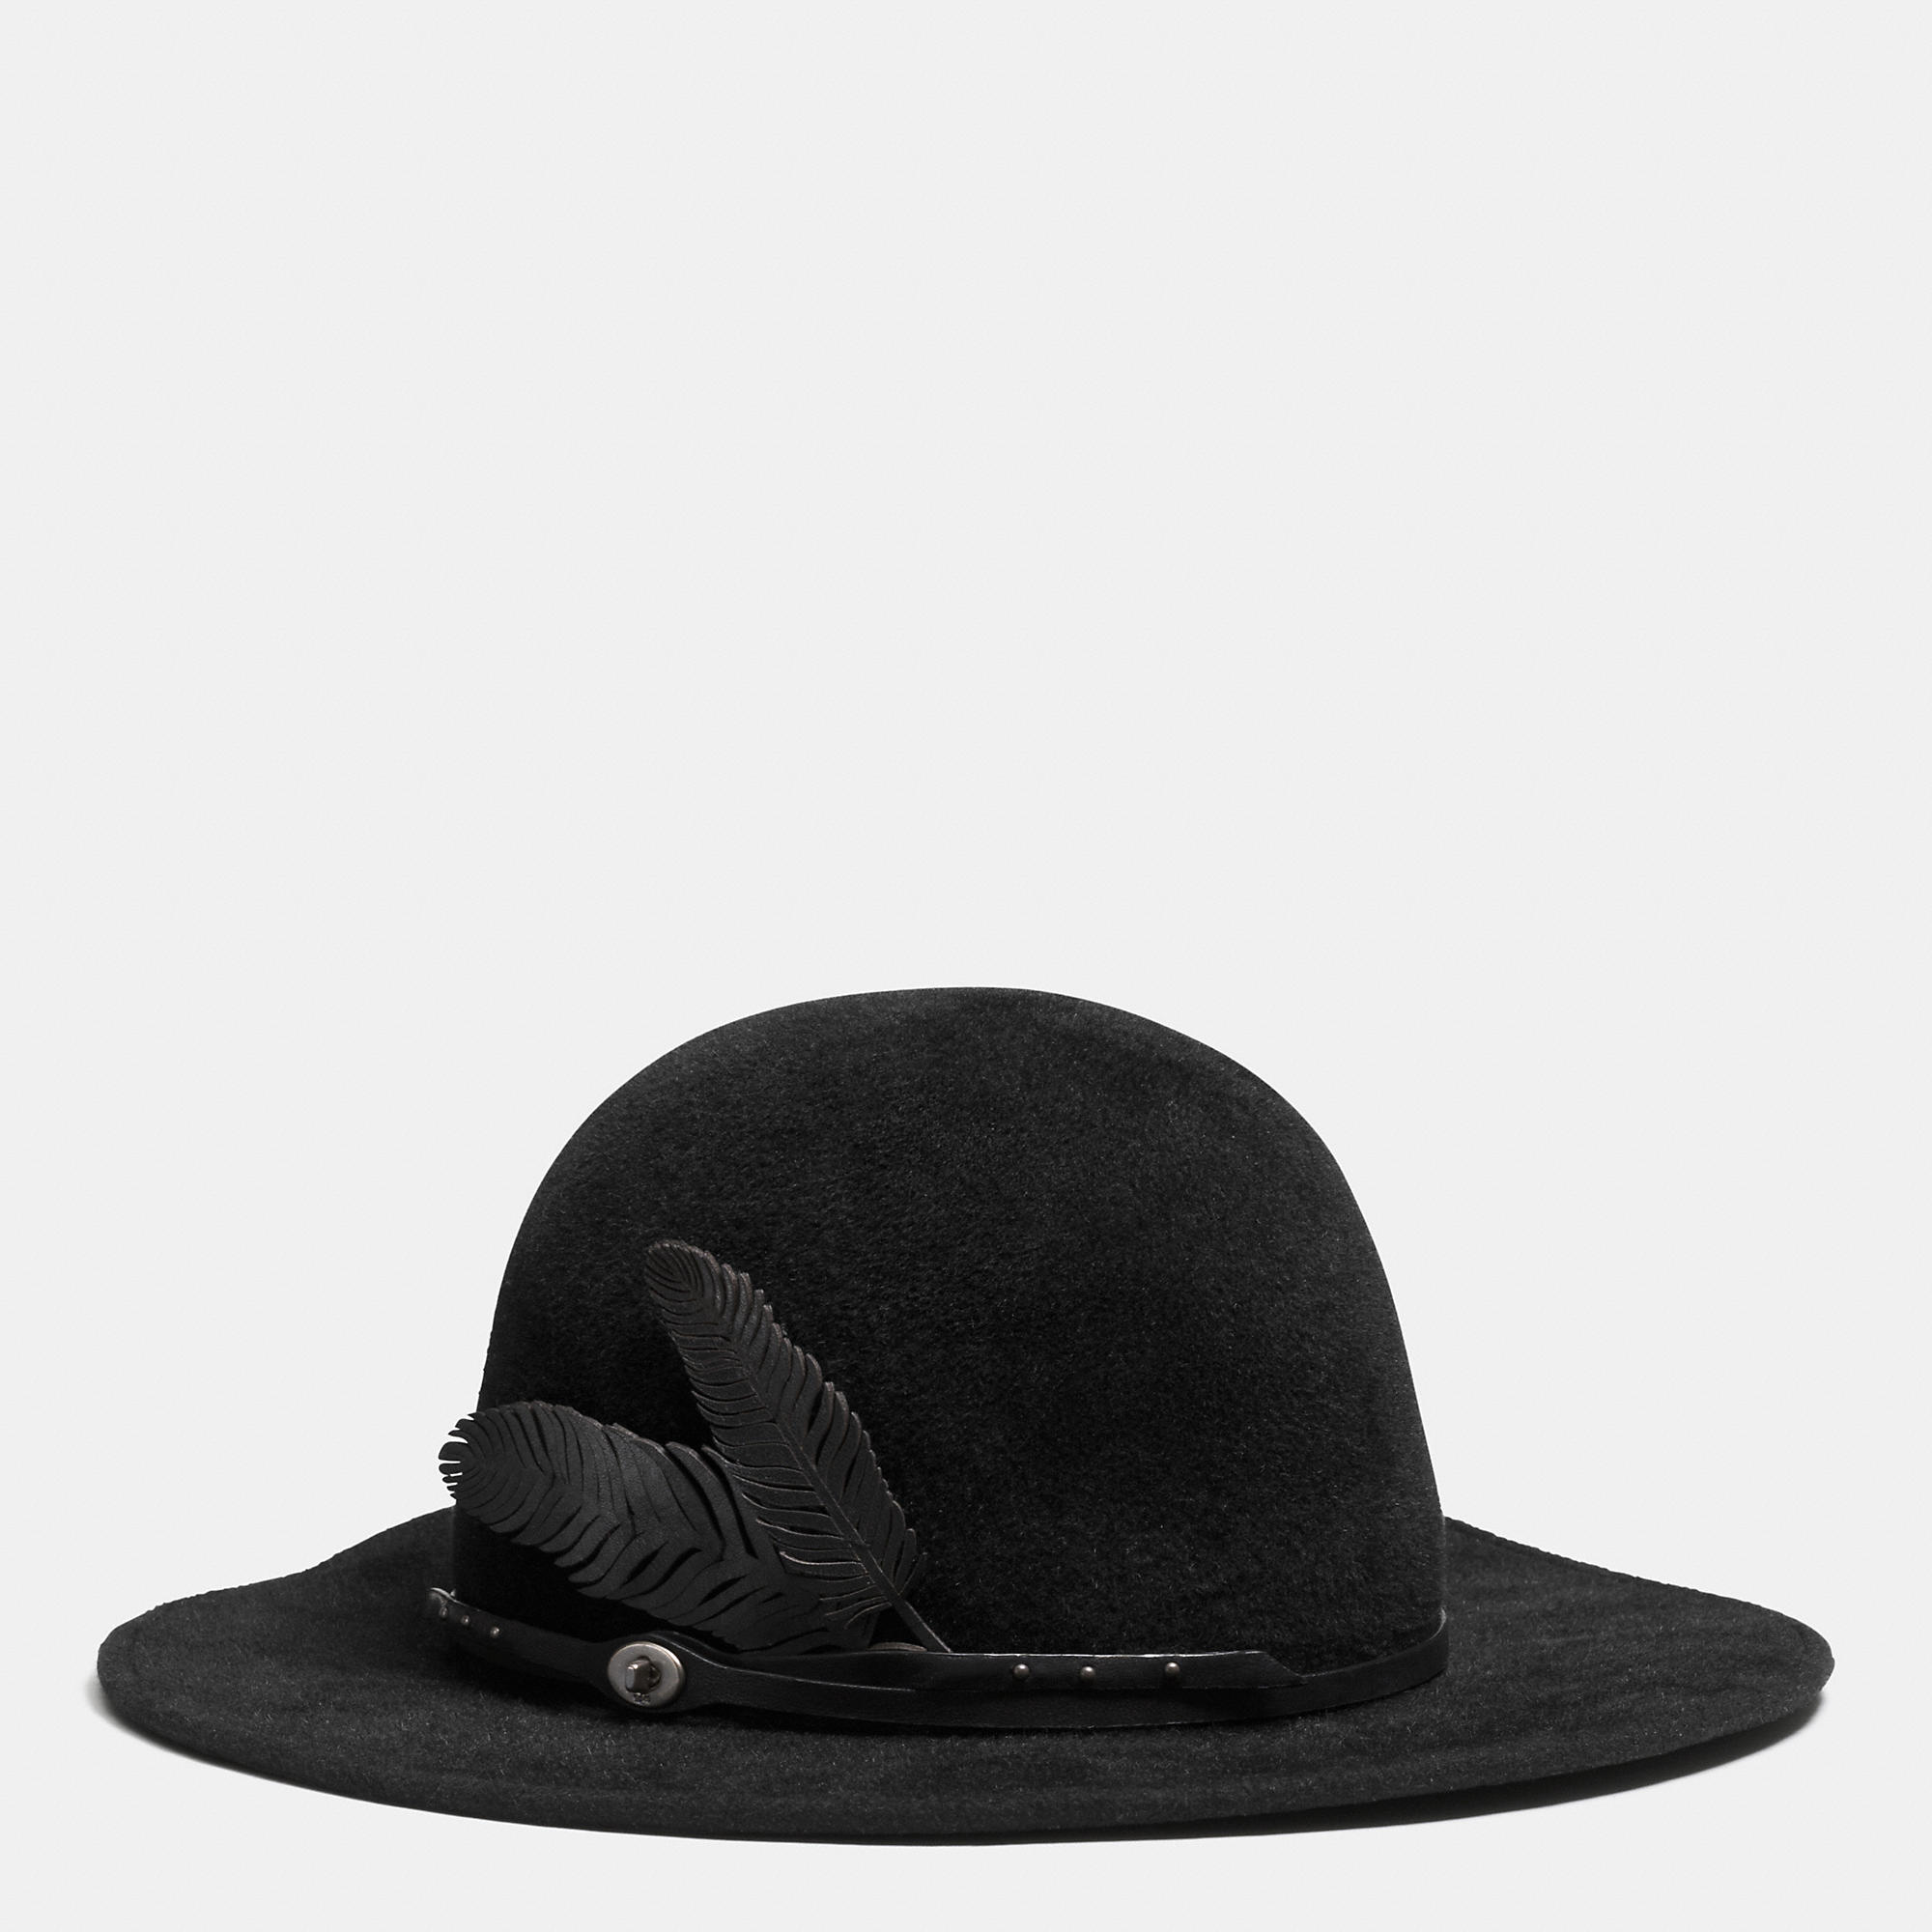 Coach Felt Hat | Fancy Friday – Coach Fall 2014 Collection